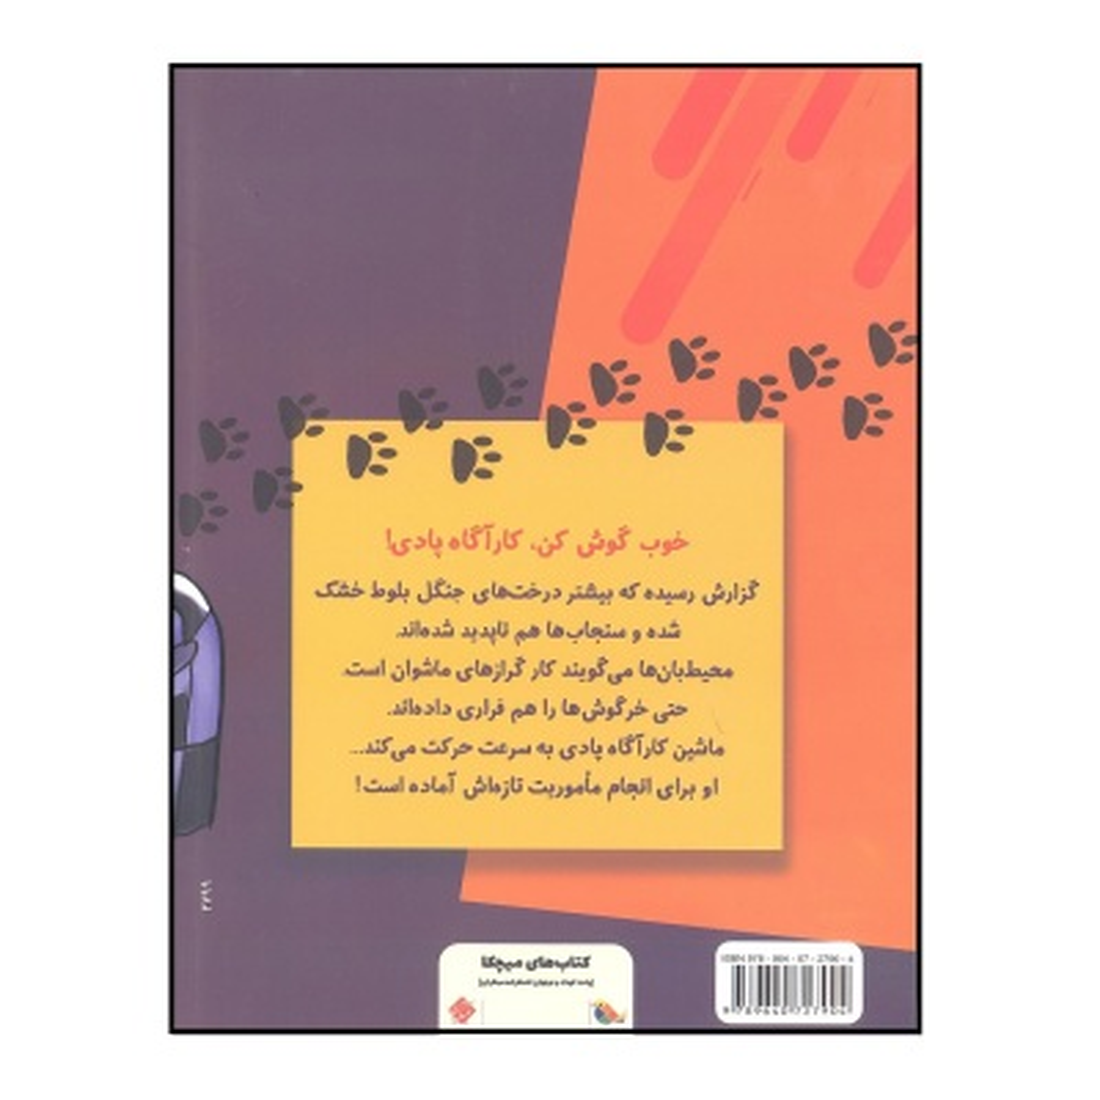 کتاب کارآگاه پادی در جنگل بلوط اثر نوشین شعبانی انتشارات میچکا